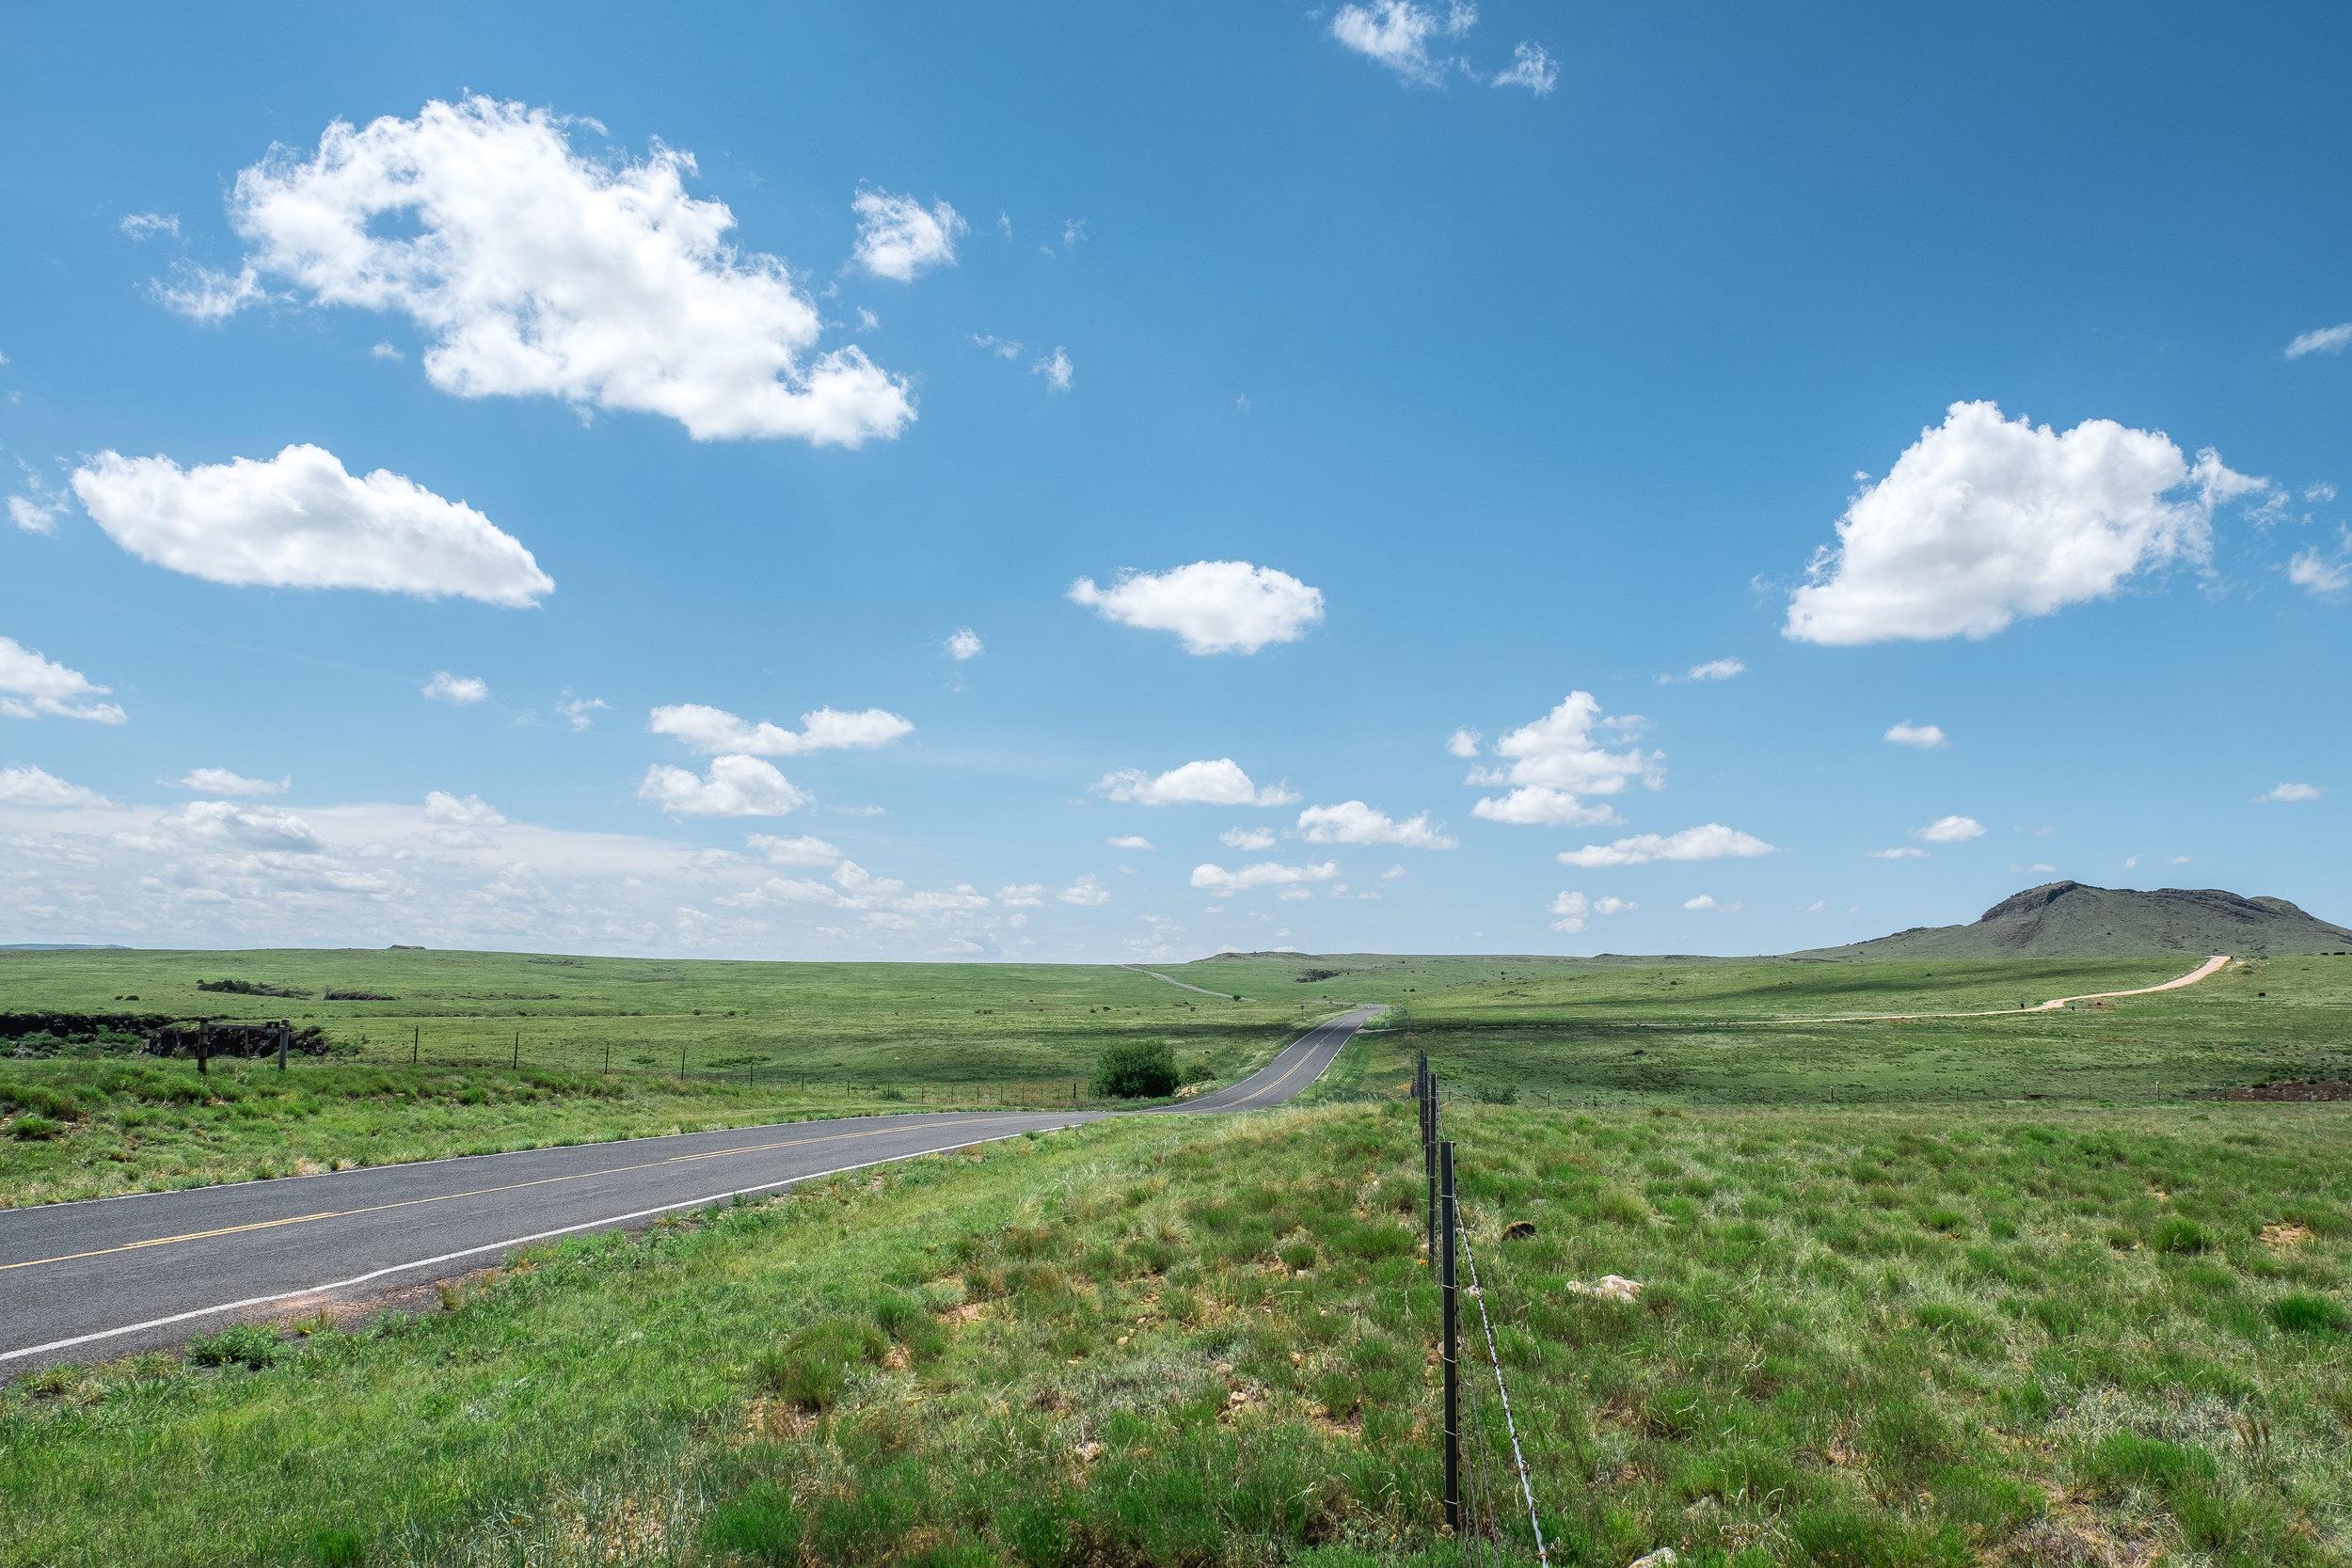 The Great American Roadtrip [Part 2]_192.jpg